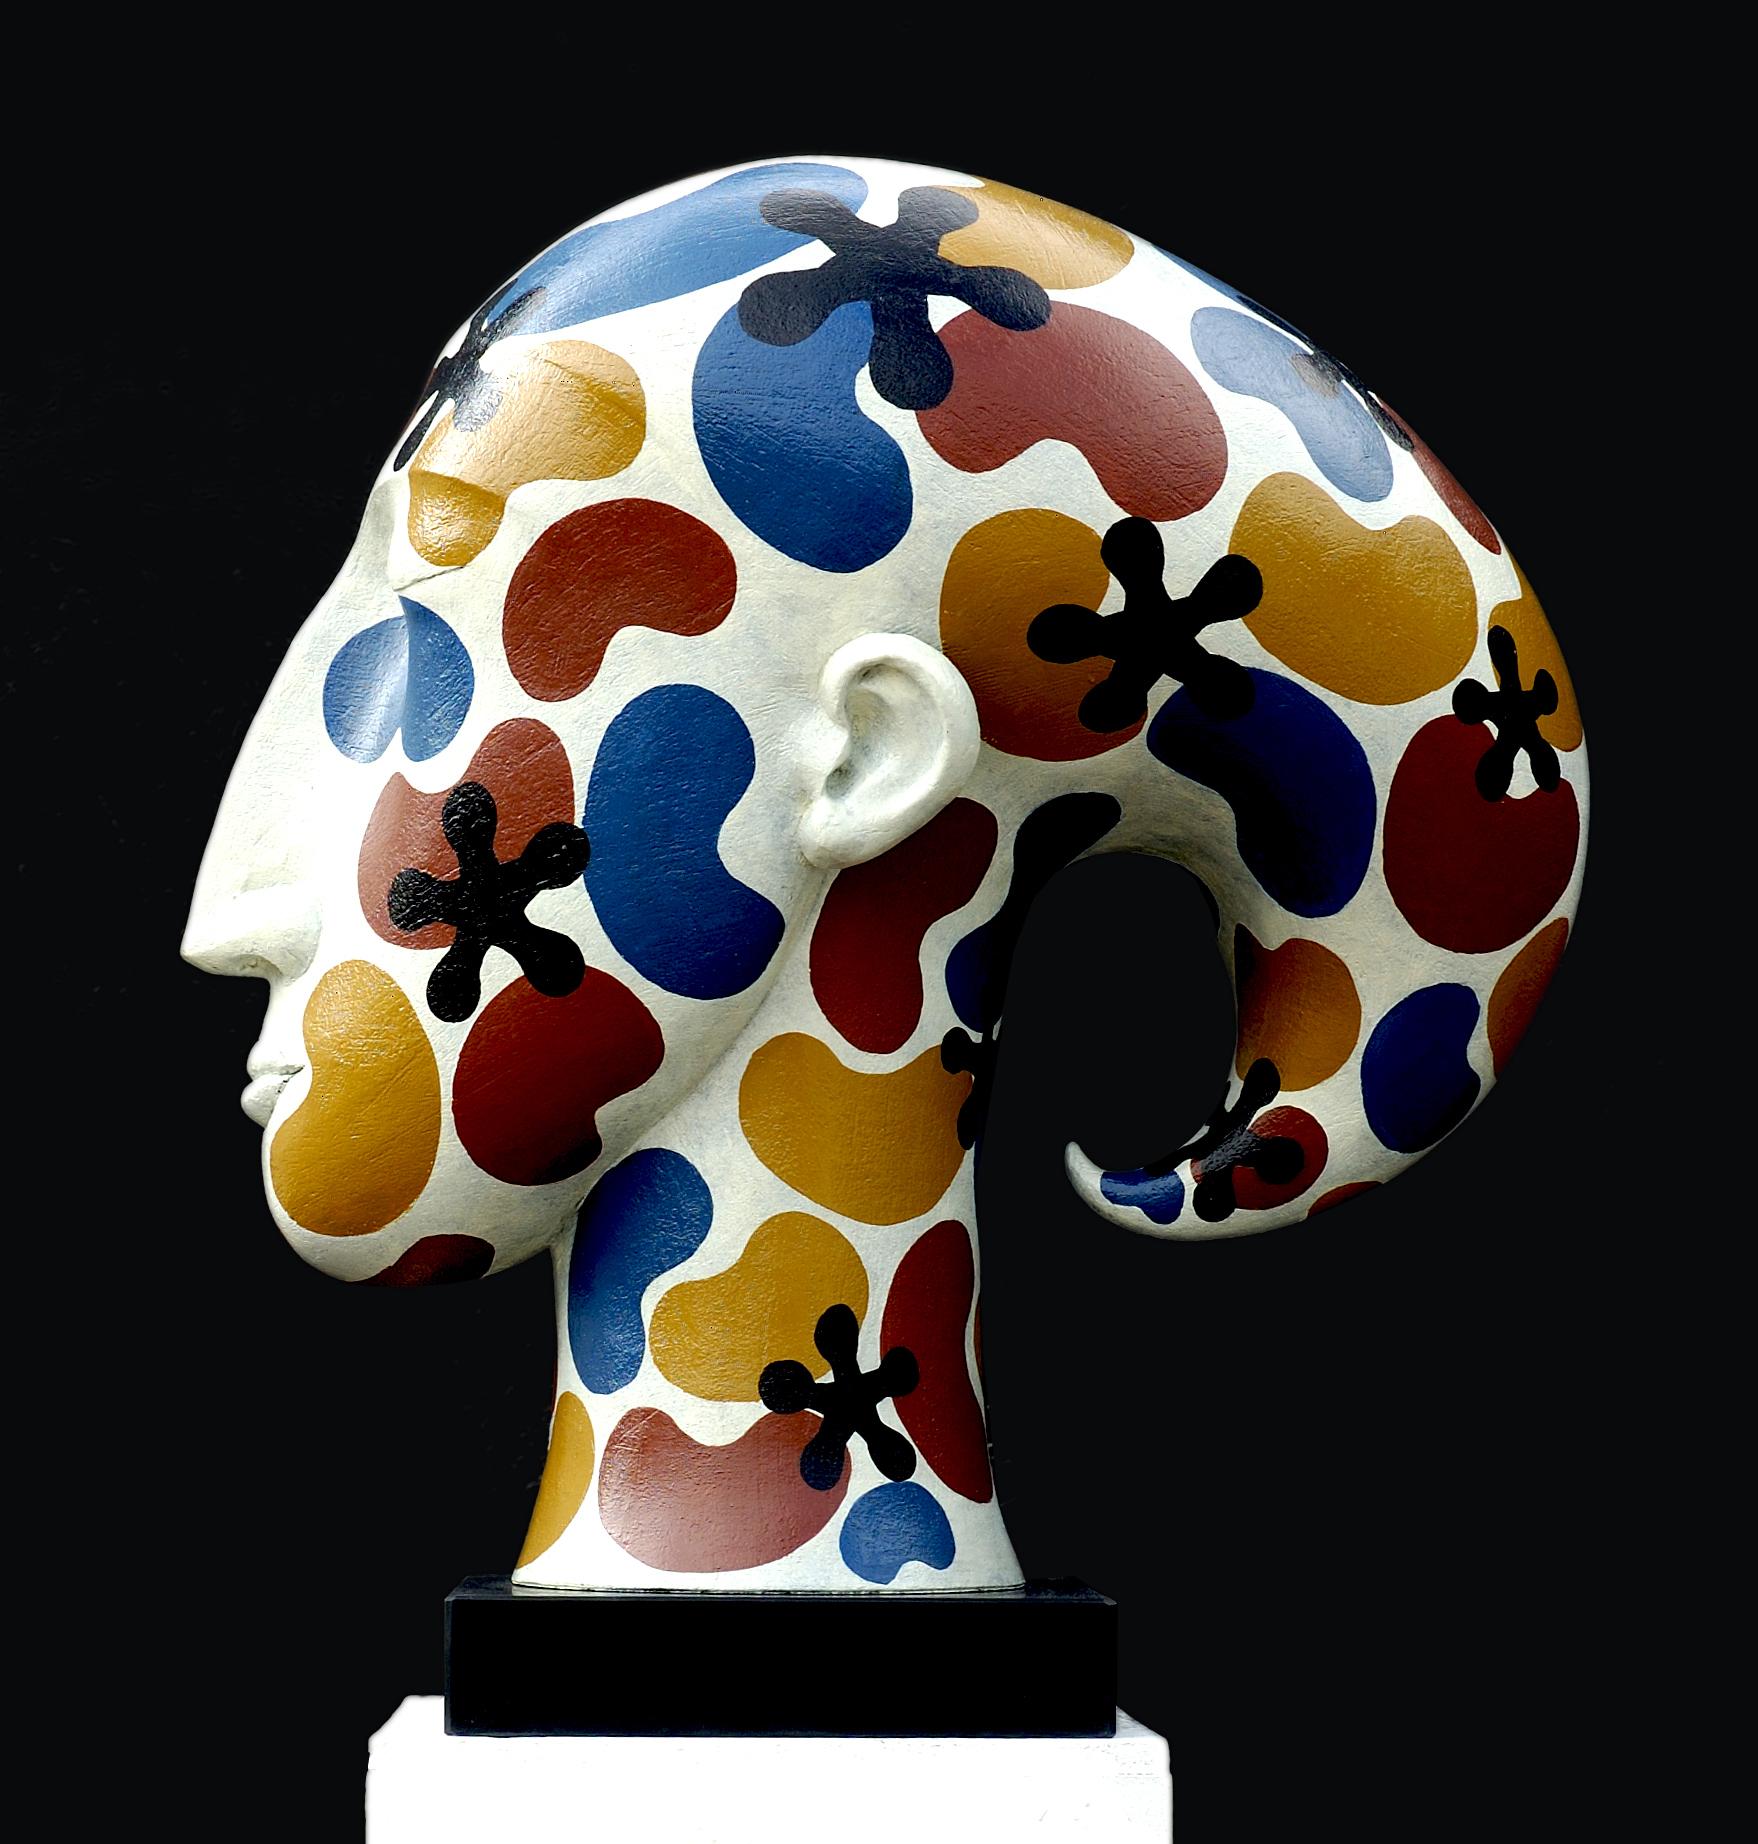 Patricia Volk FRBS, Trickster, Ceramic, 60 x 52 x 26cm